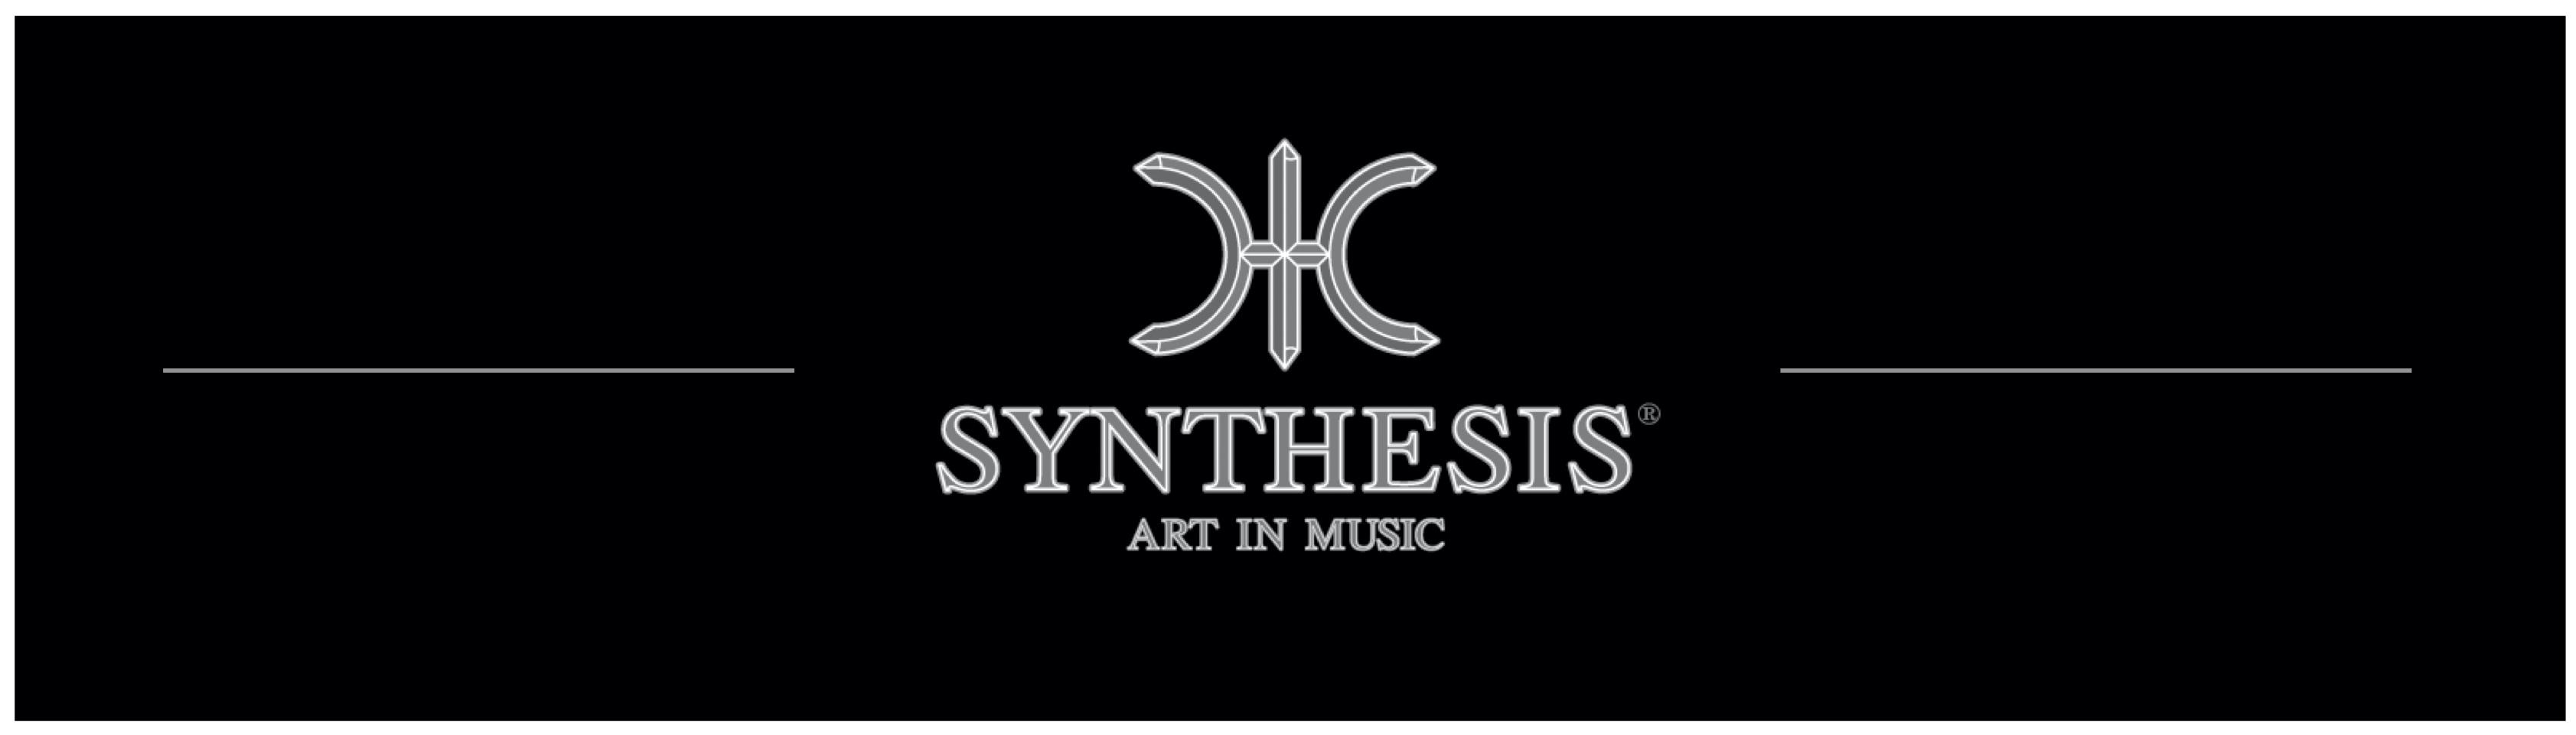 synthesis-logo.jpg